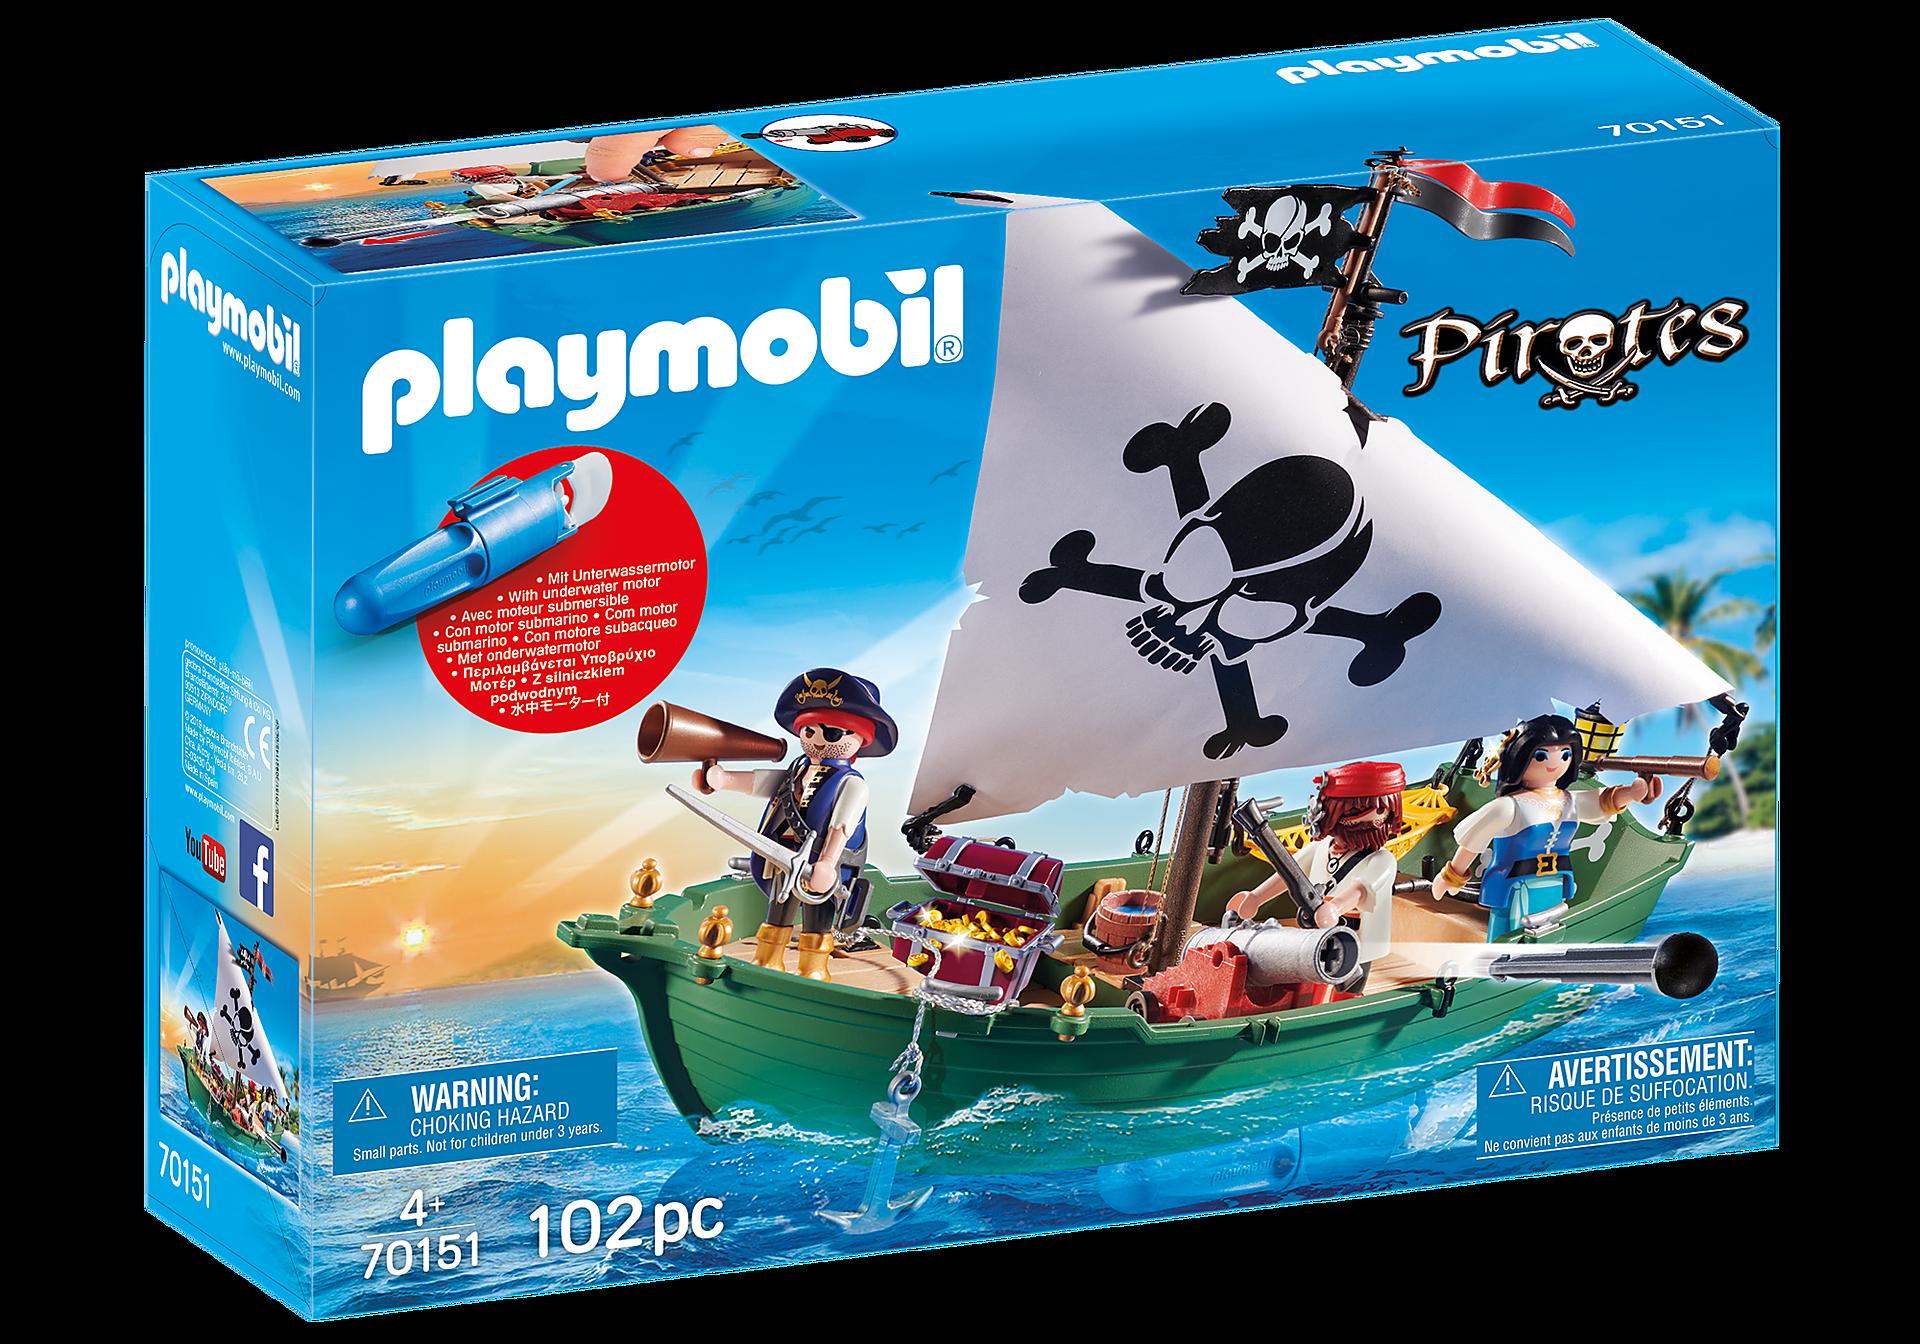 http://media.playmobil.com/i/playmobil/70151_product_box_front/Piratenschuit met onderwatermotor